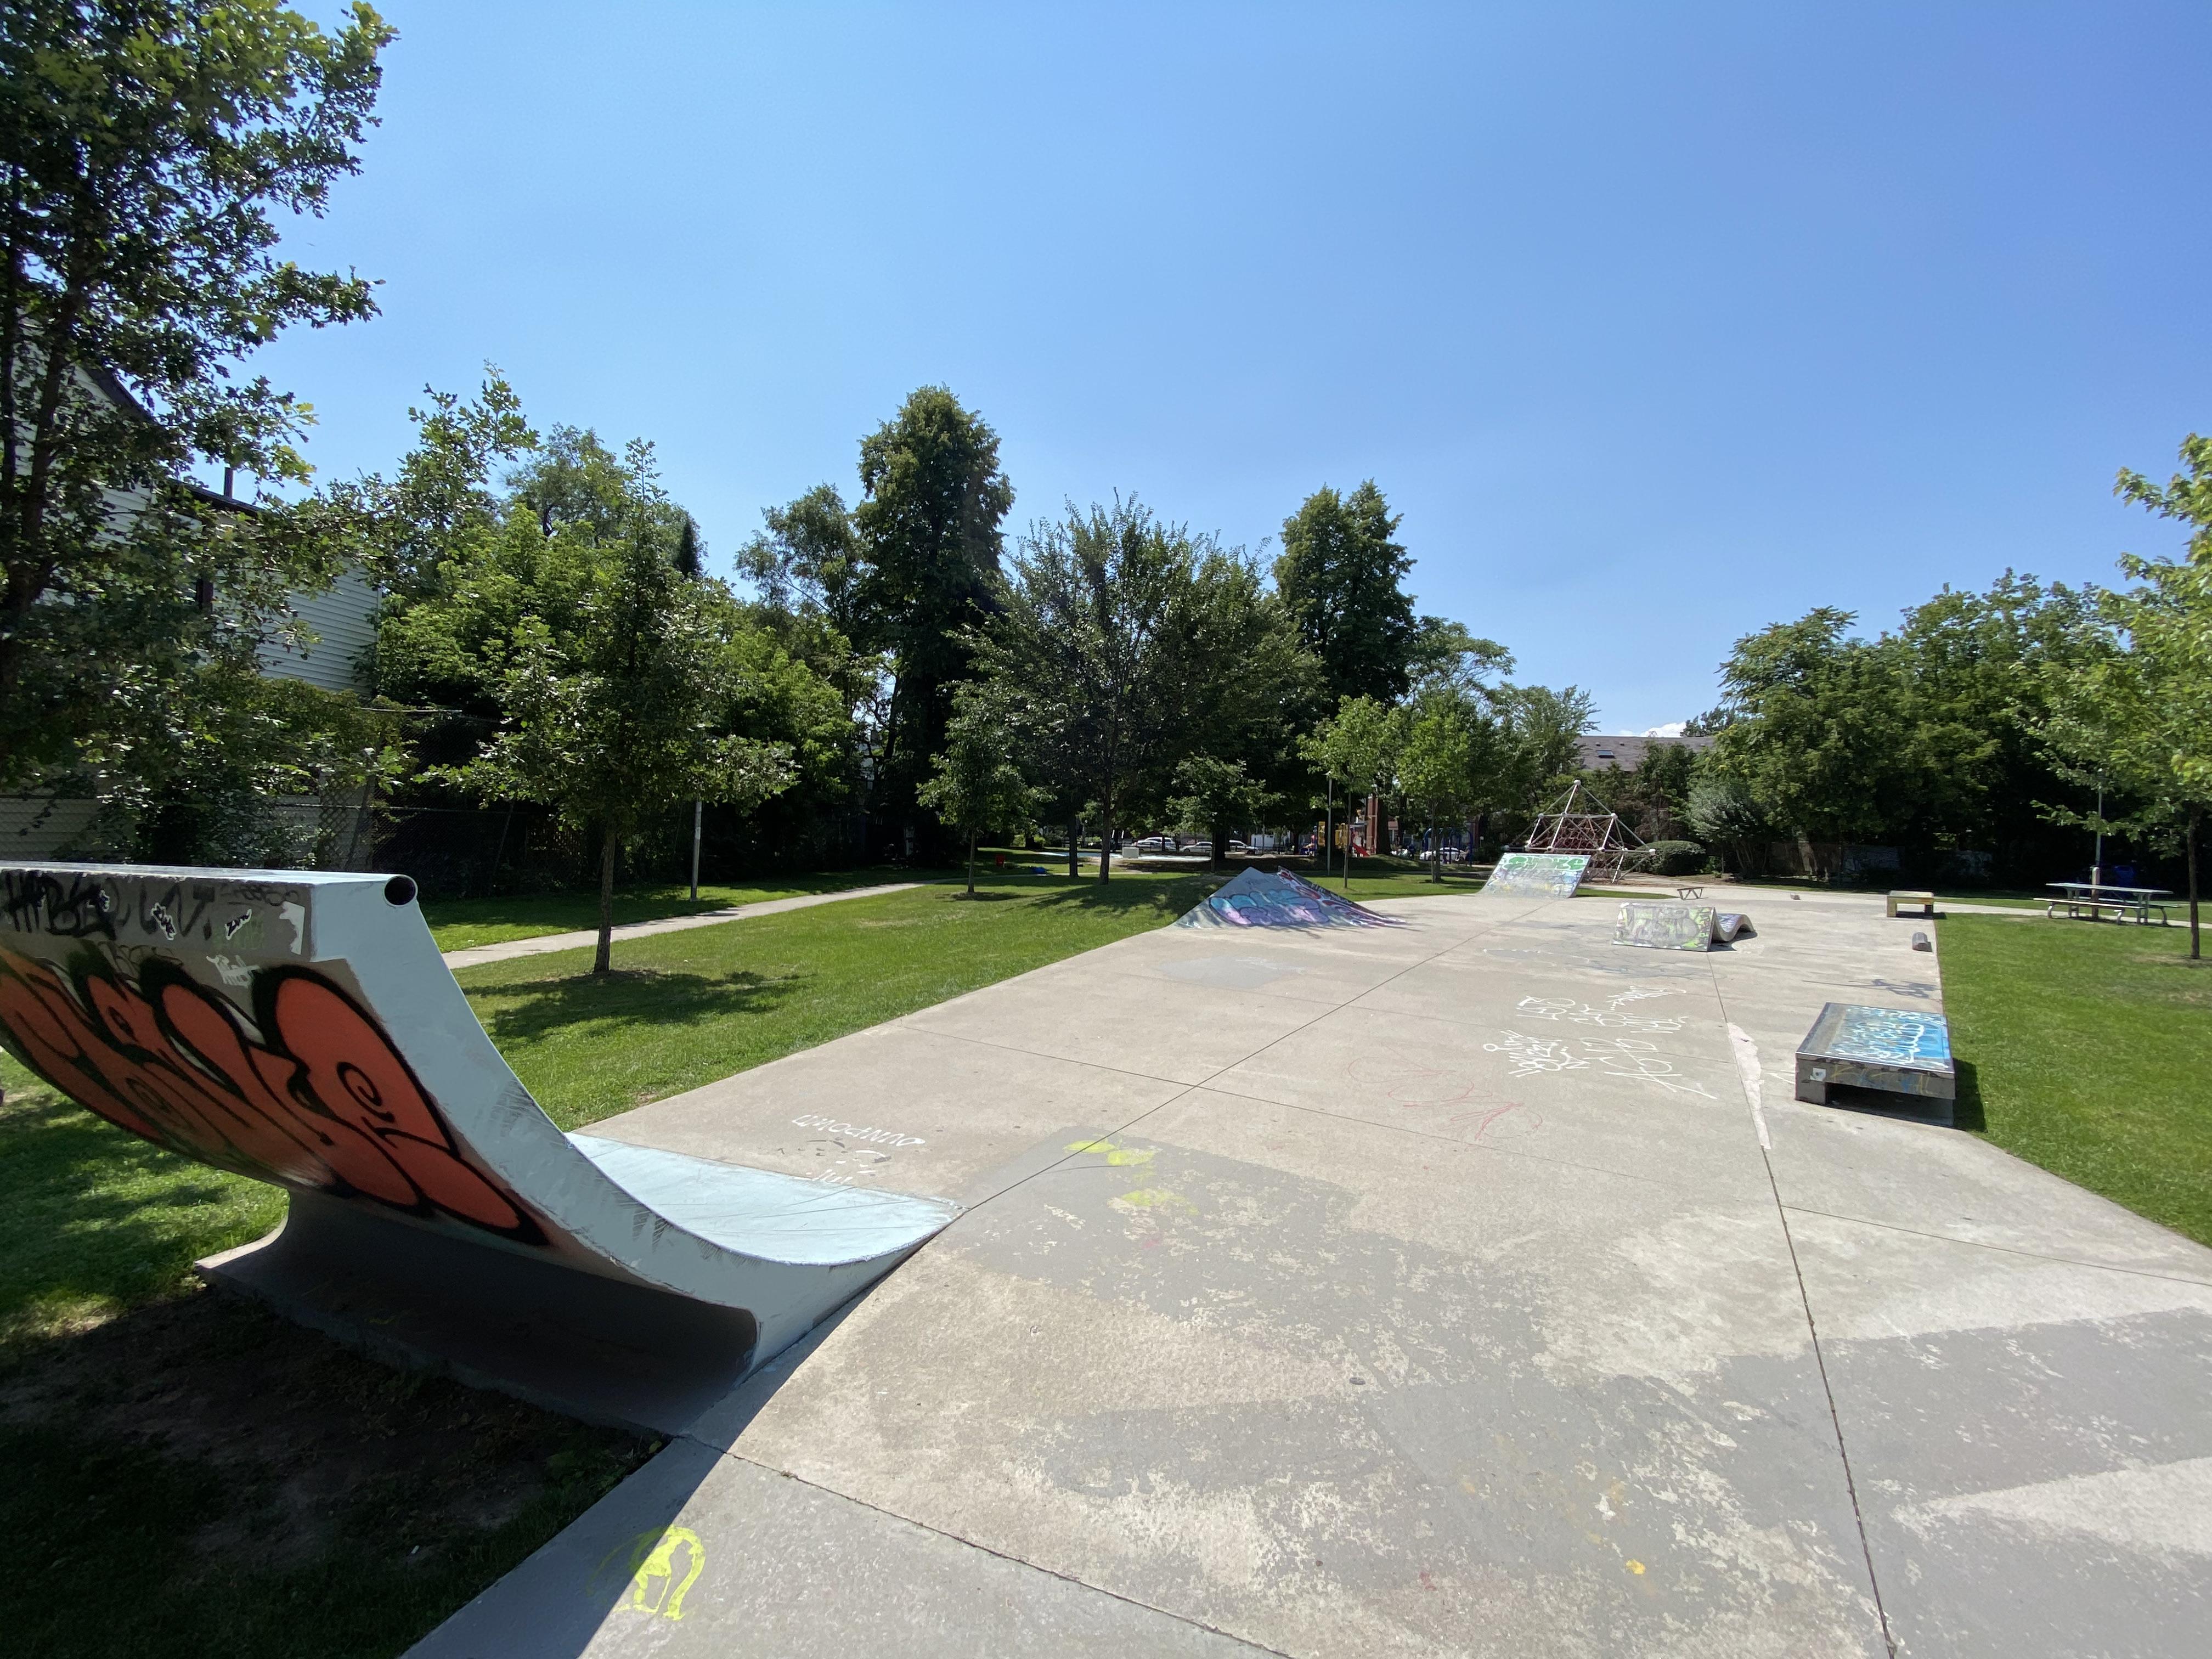 toronto parkdale skatepark from the back